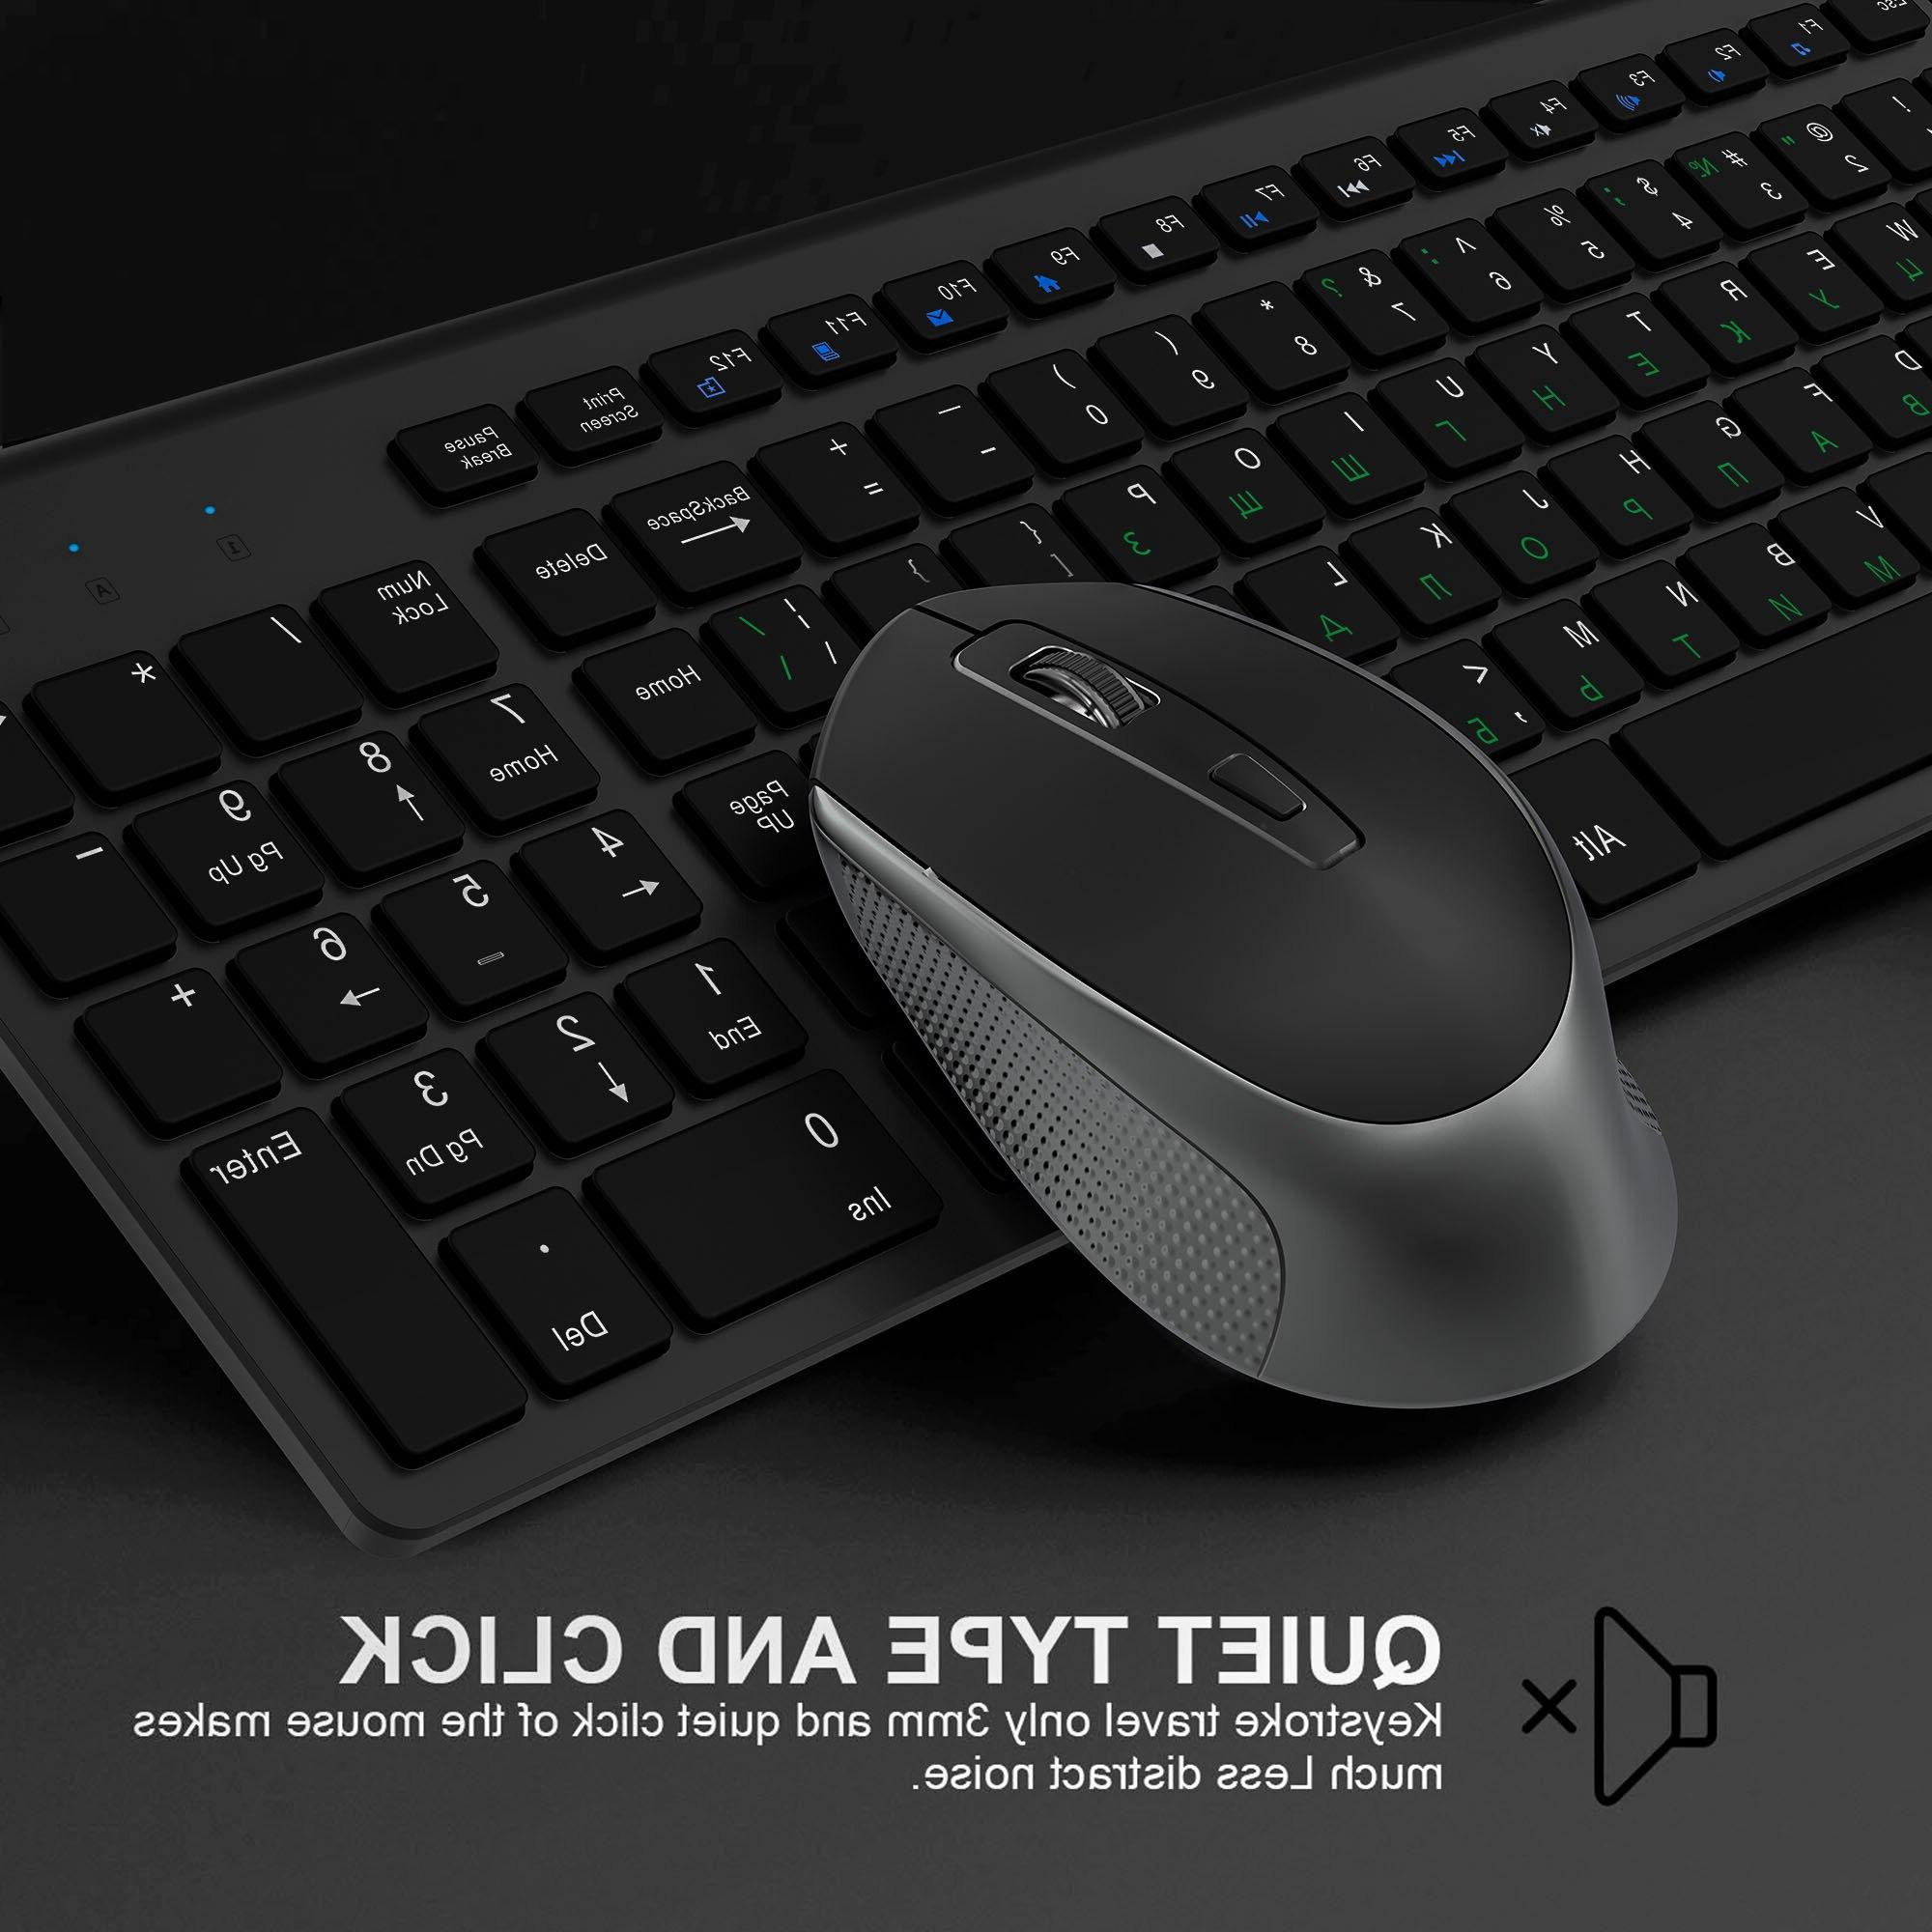 <font><b>JOYACCESS</b></font> <font><b>Wireless</b></font> <font><b>Keyboard</b></font> Mouse Set Ergonomic PC <font><b>Keyboard</b></font> 2.4G